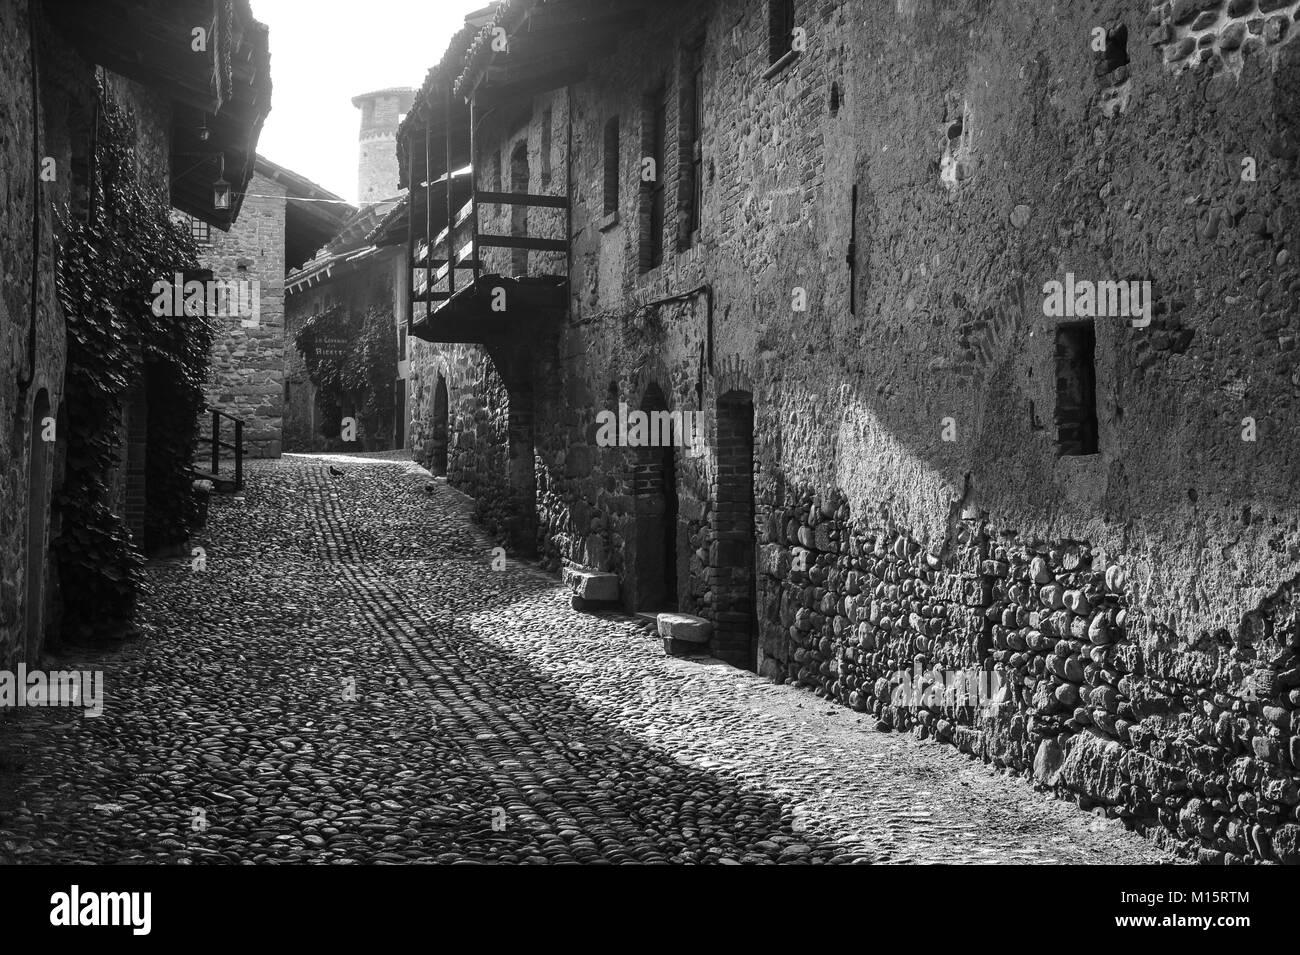 Door detail in Ricetto di Candelo, Biella, Italy - Stock Image